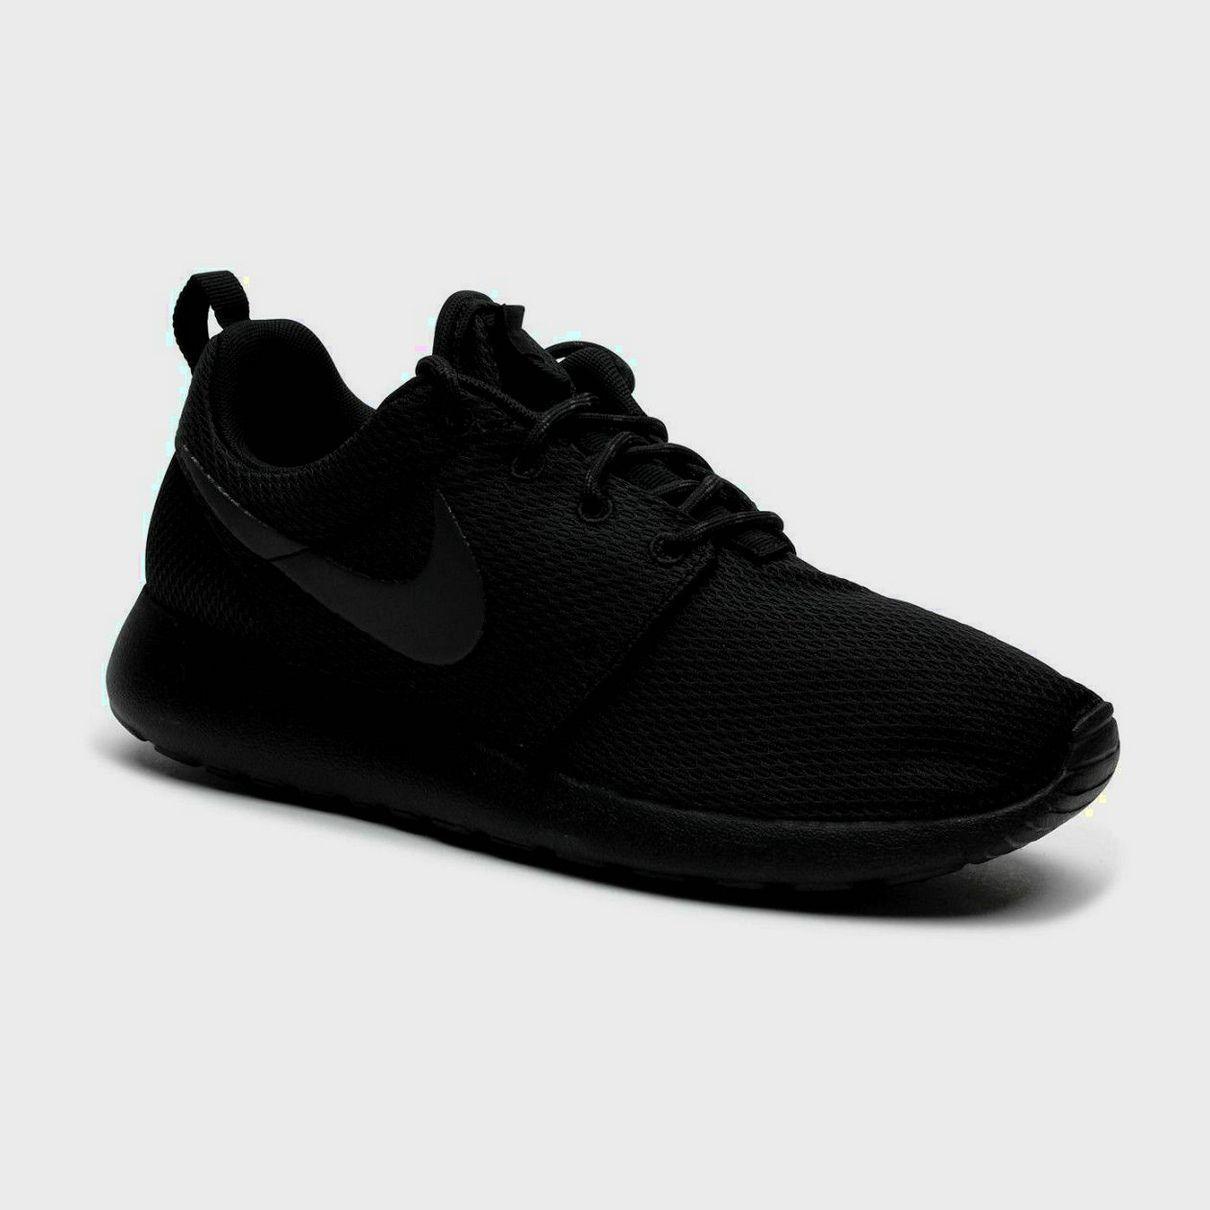 afe0b05ad408 Nike Shoes on